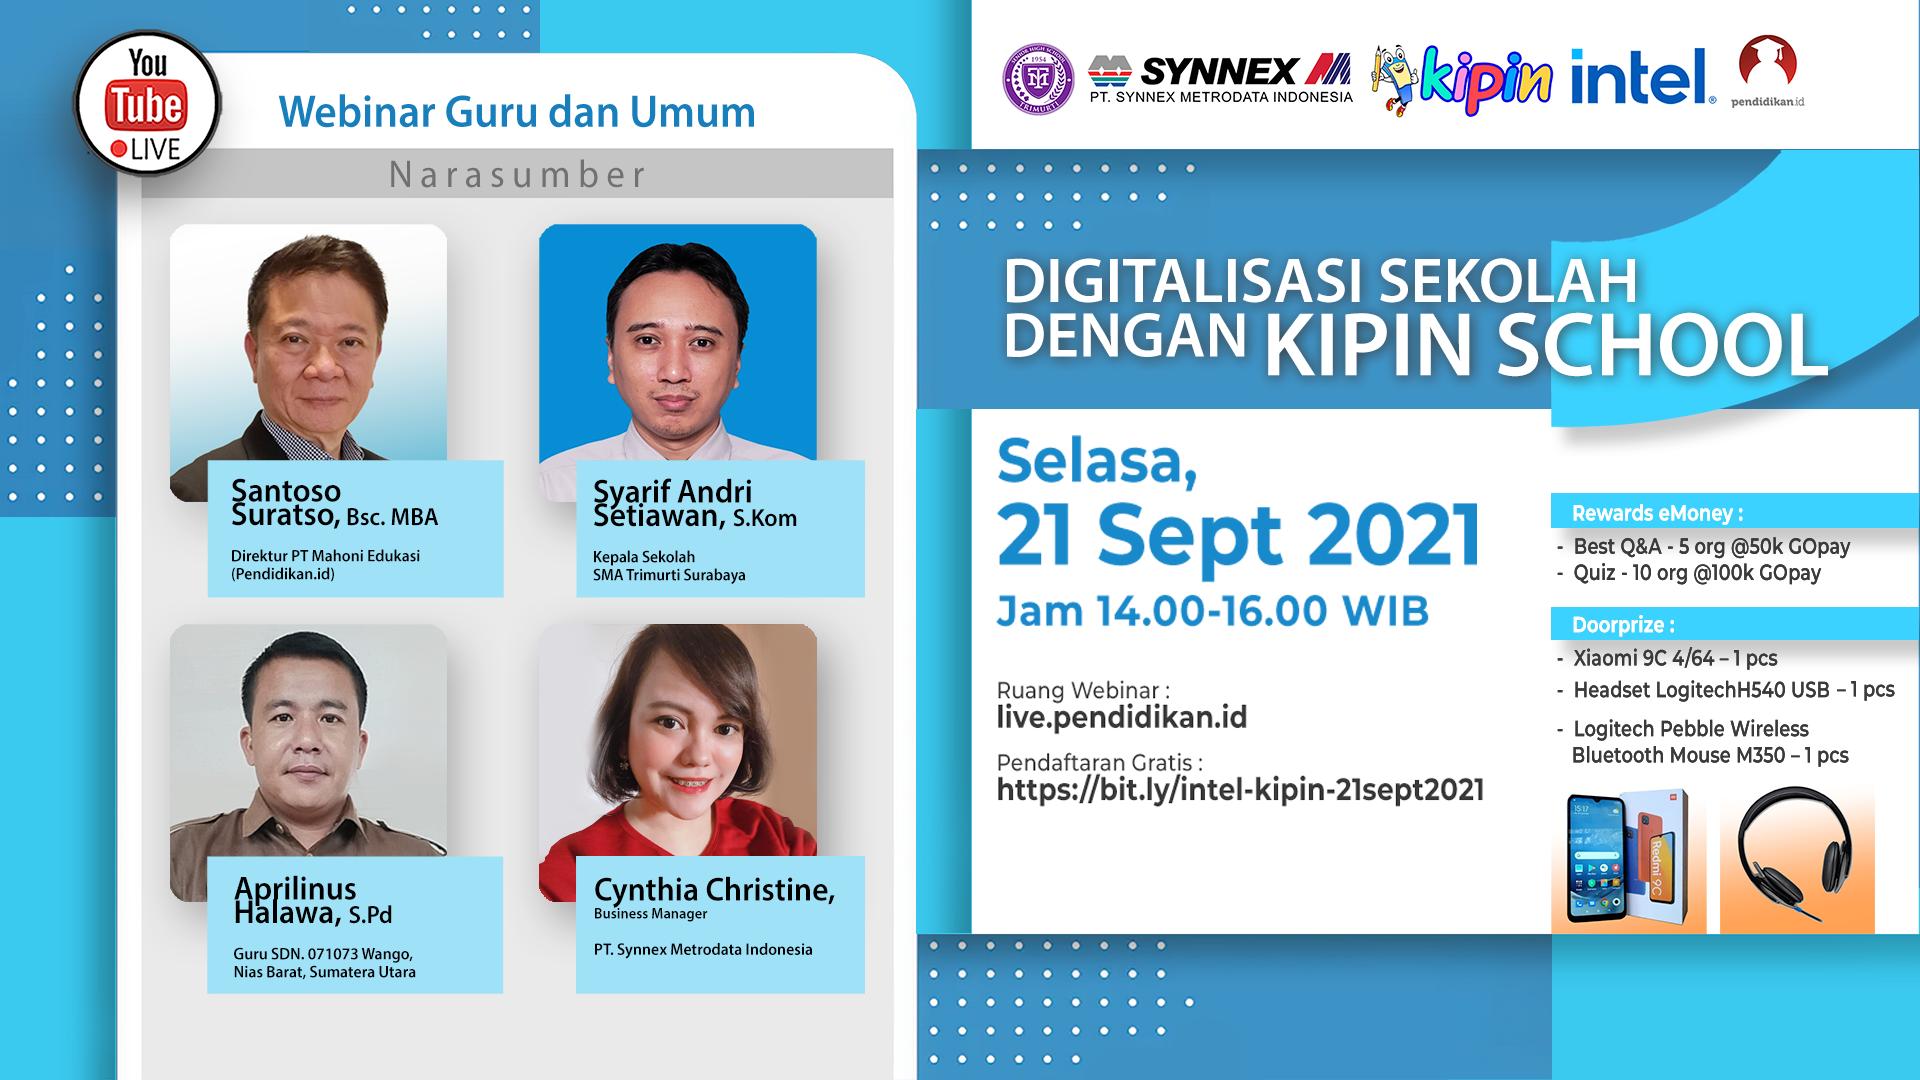 https://www.synnexmetrodata.com/wp-content/uploads/2021/09/EDM-Webinar-Intel-x-Kipin-Digitalisasi-Sekolah-dengan-Kipin-School.png